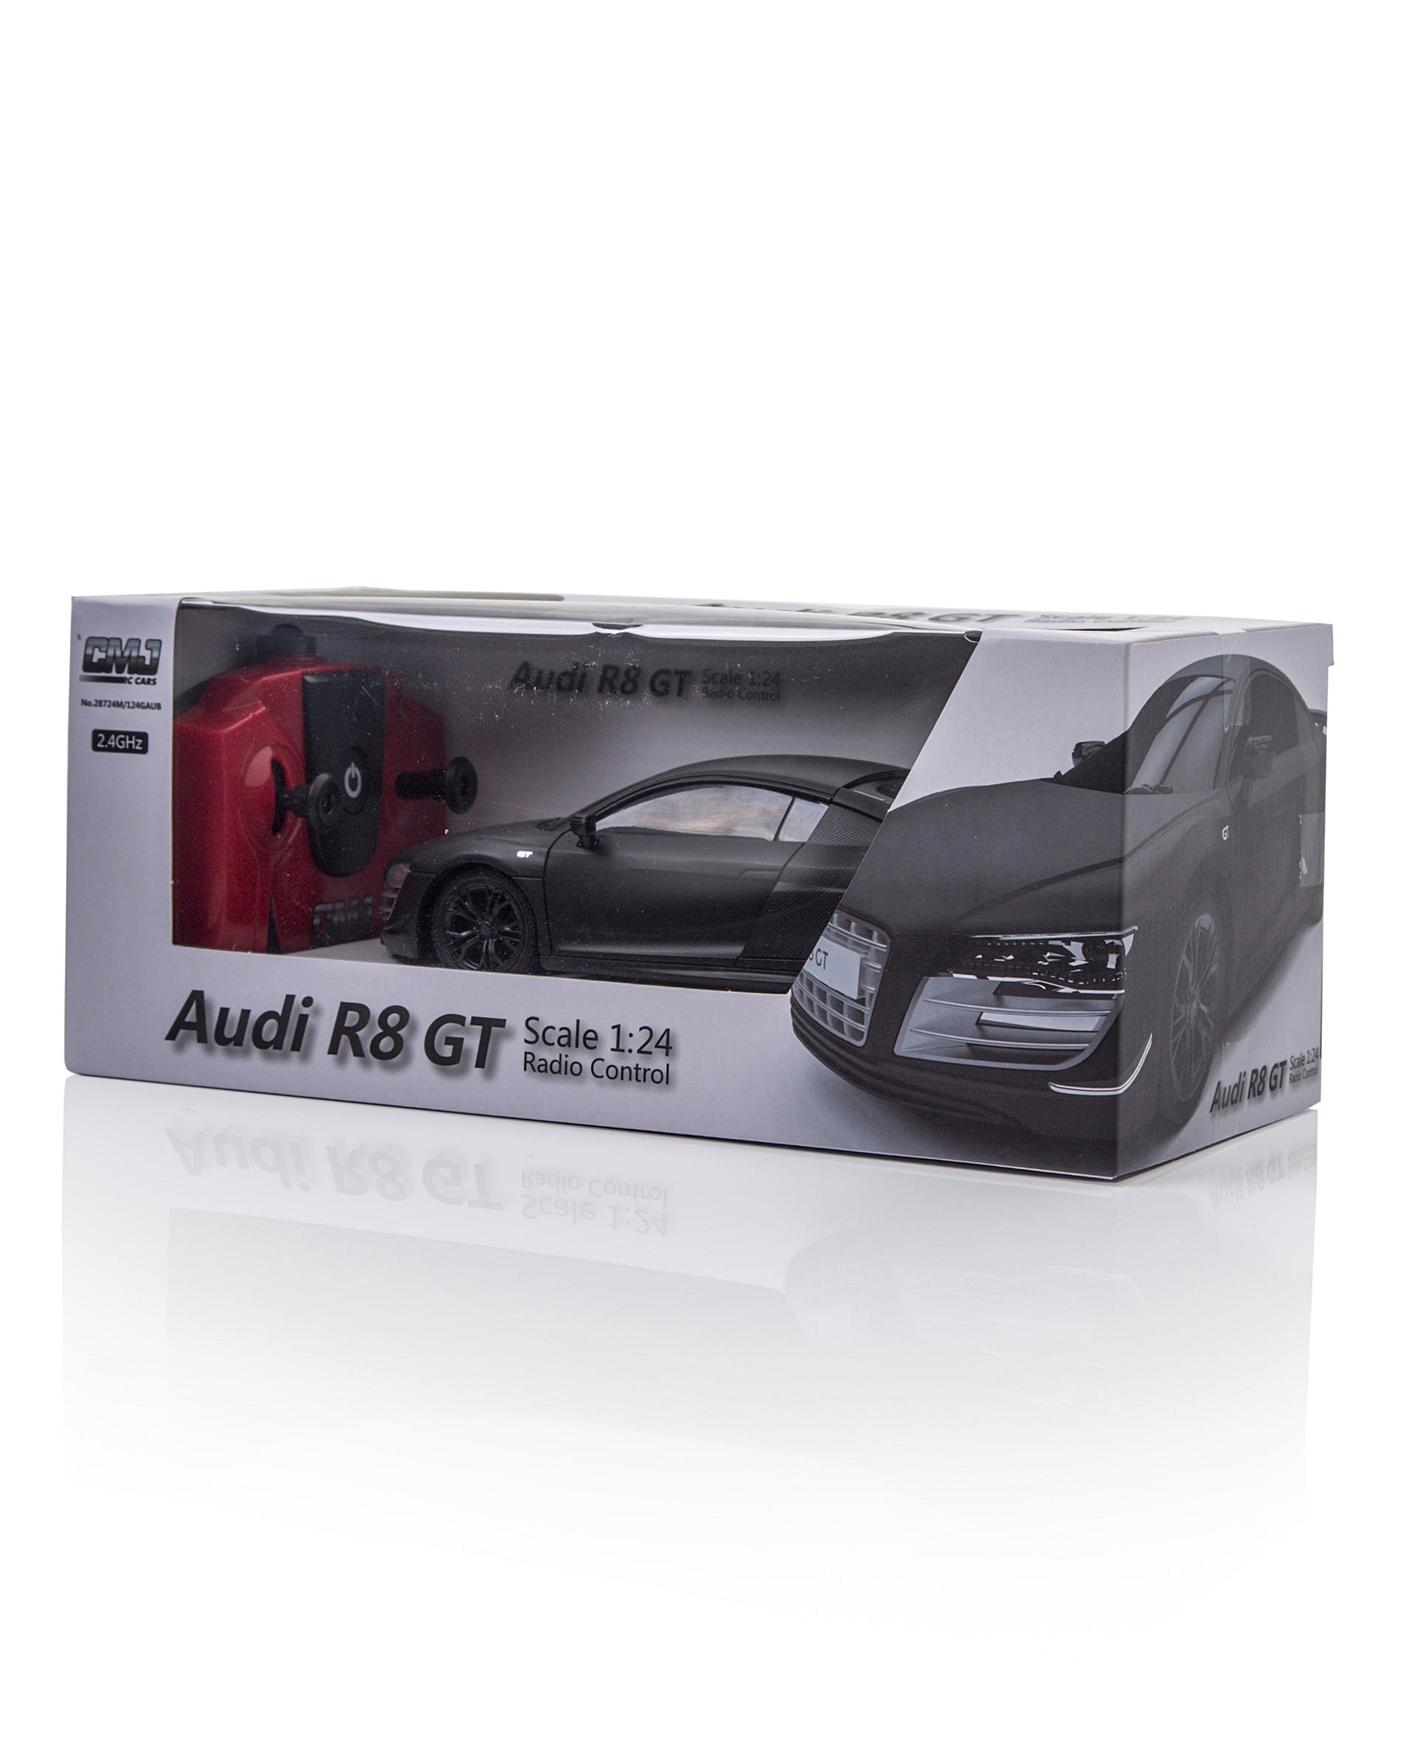 1:24 RC Audi R8 GT Black